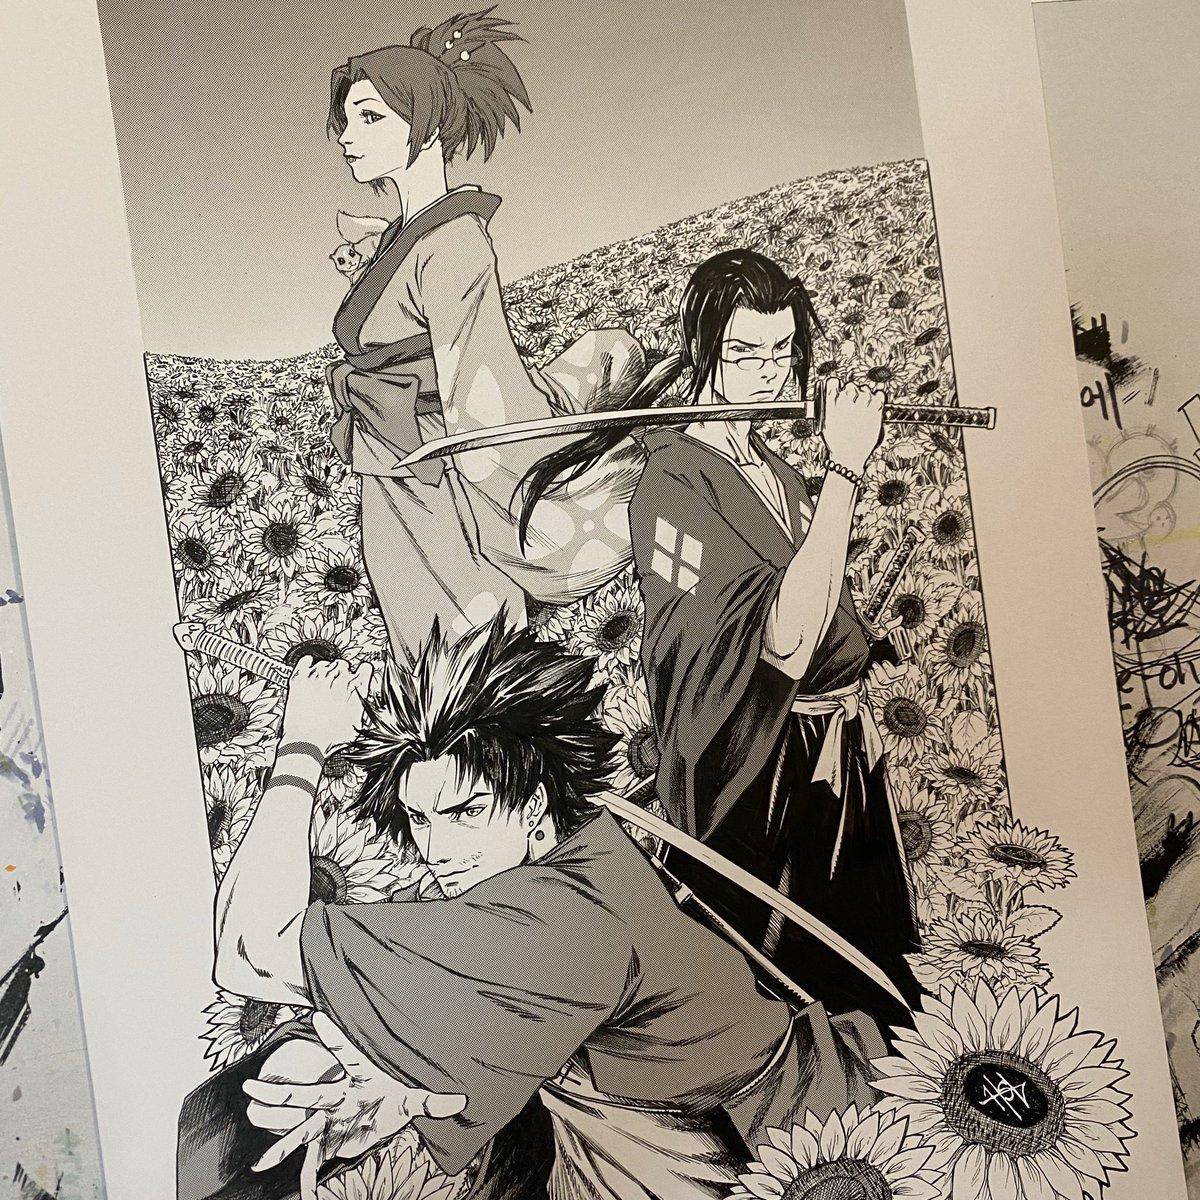 Samurai Champloo commission using screentones! #samuraichamploo #samurai #champloo #mugen #jin #fuu #nujabes #sunflower #artpic.twitter.com/ouPpXGsdjP